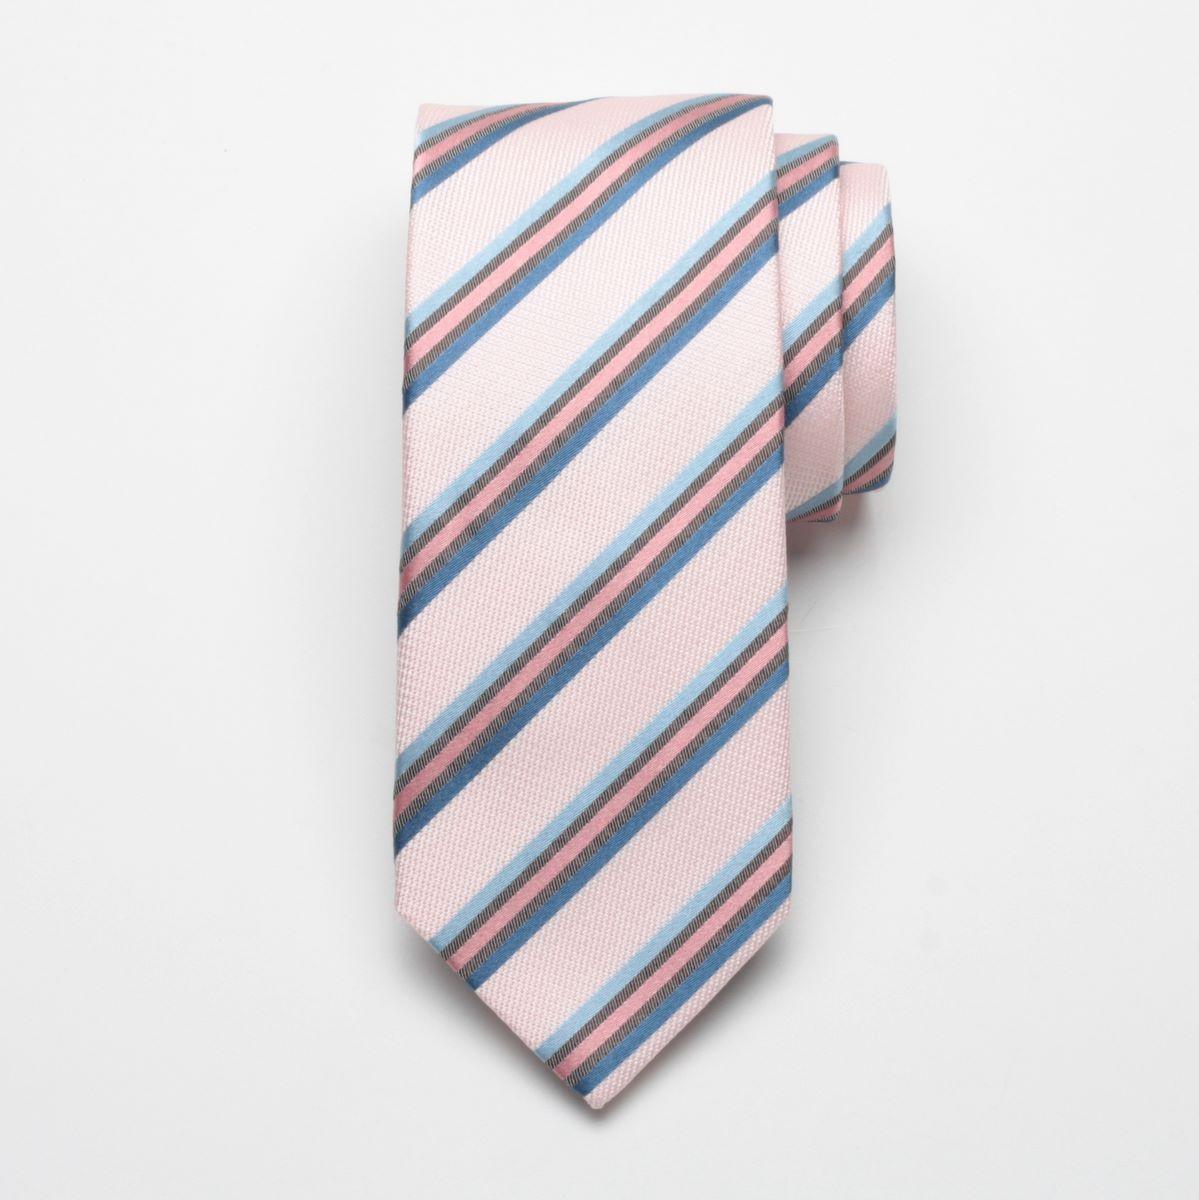 Krawat jedwabny Fine Selection (wzór 62)